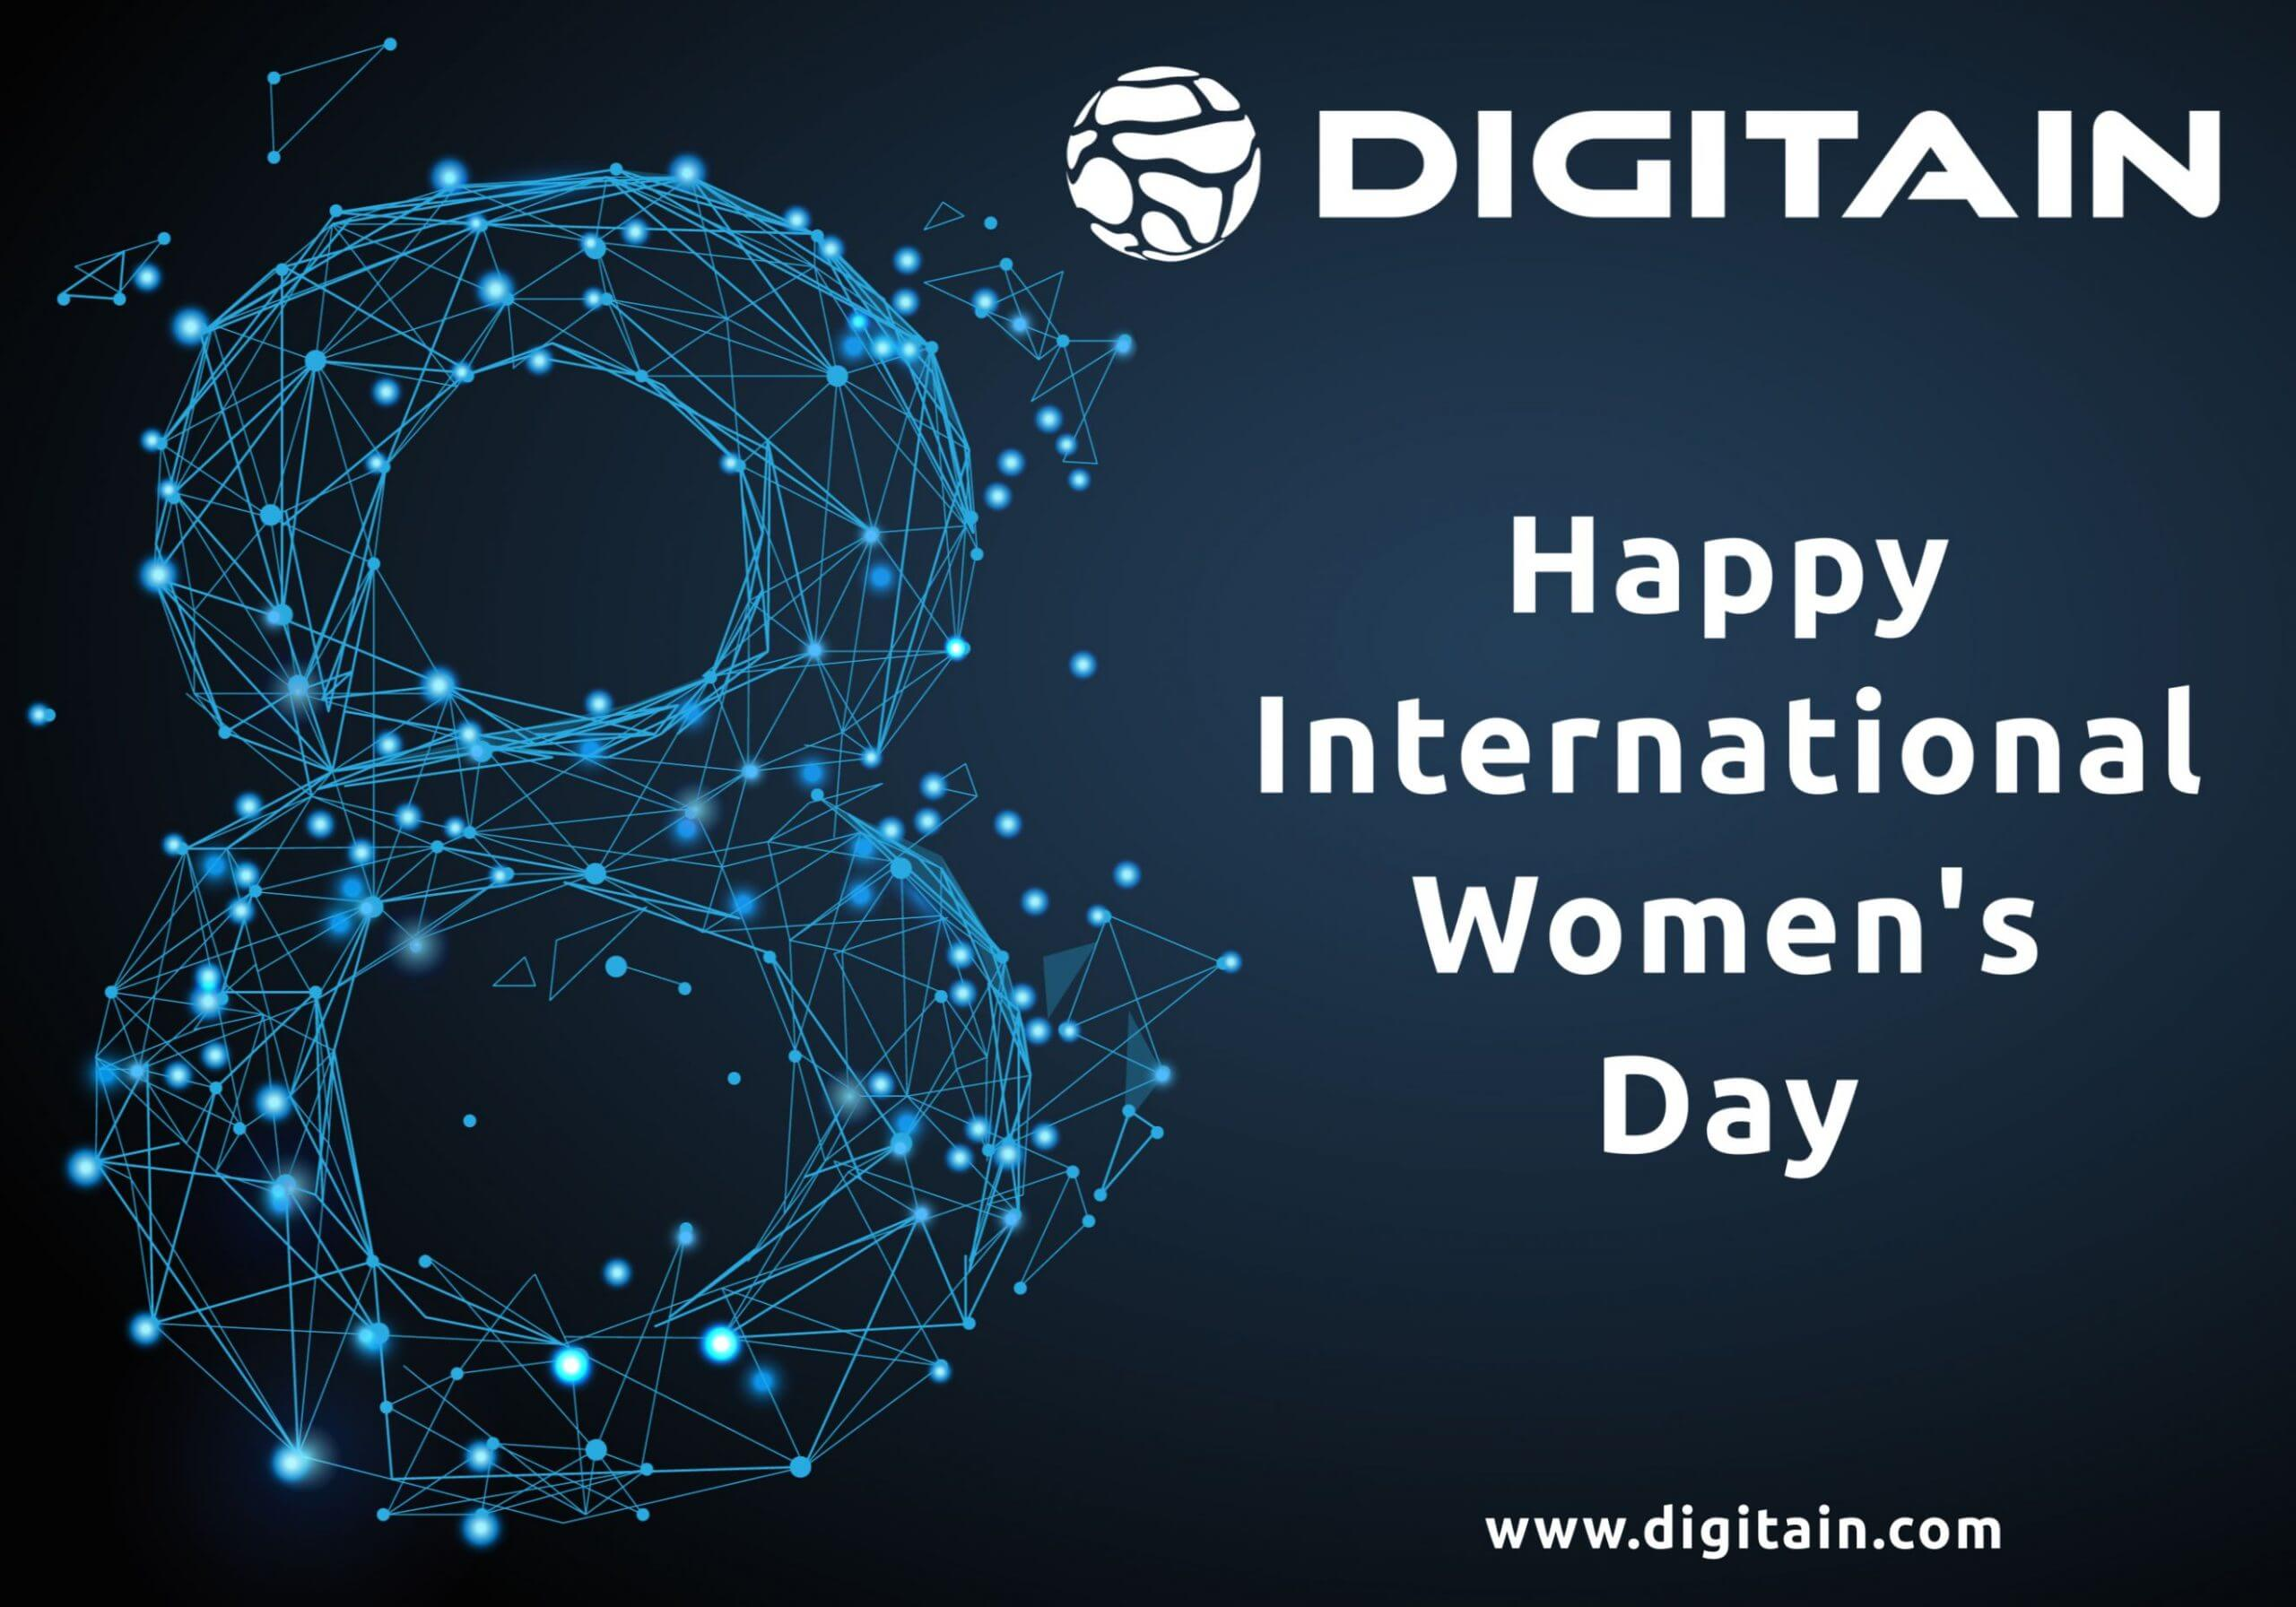 International women's day at Digitain